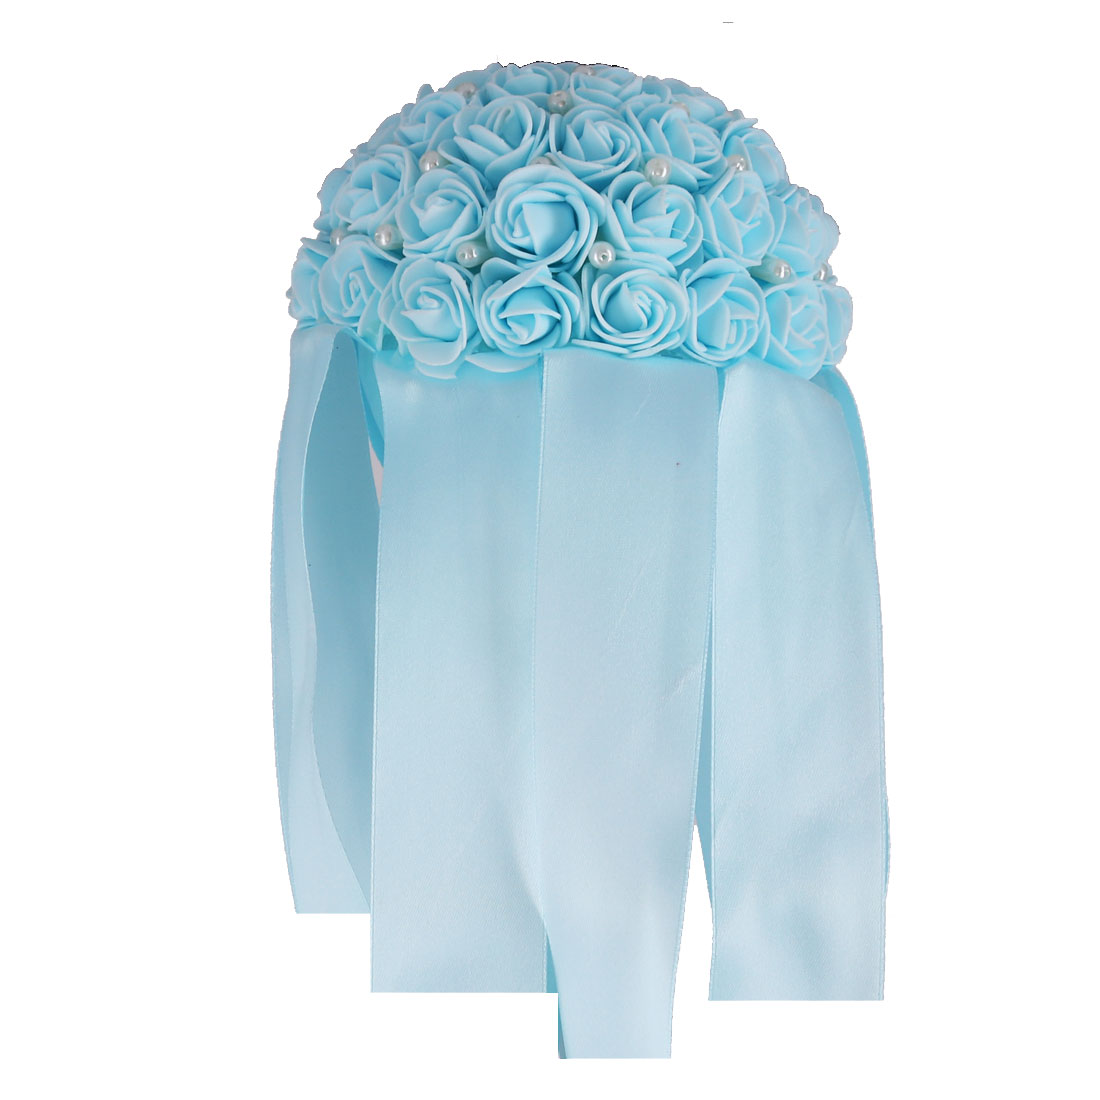 Bridal Wedding Foam Rose Flower Ribbon Beads Decor Handhold Bouquet Light Blue